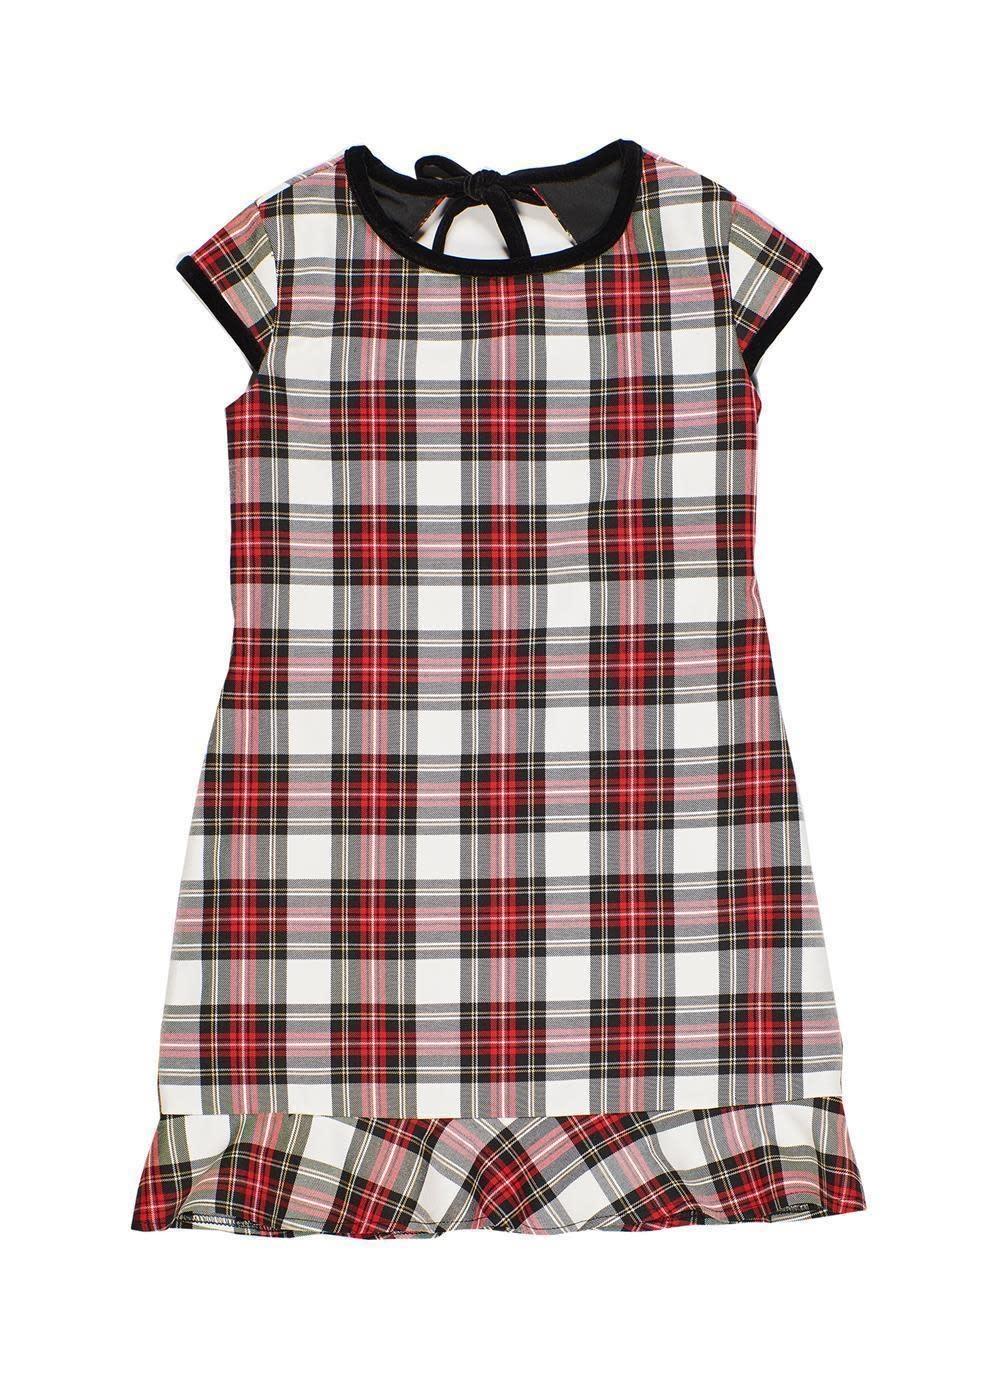 Florence Eiseman Velvet Trim Plaid Dress